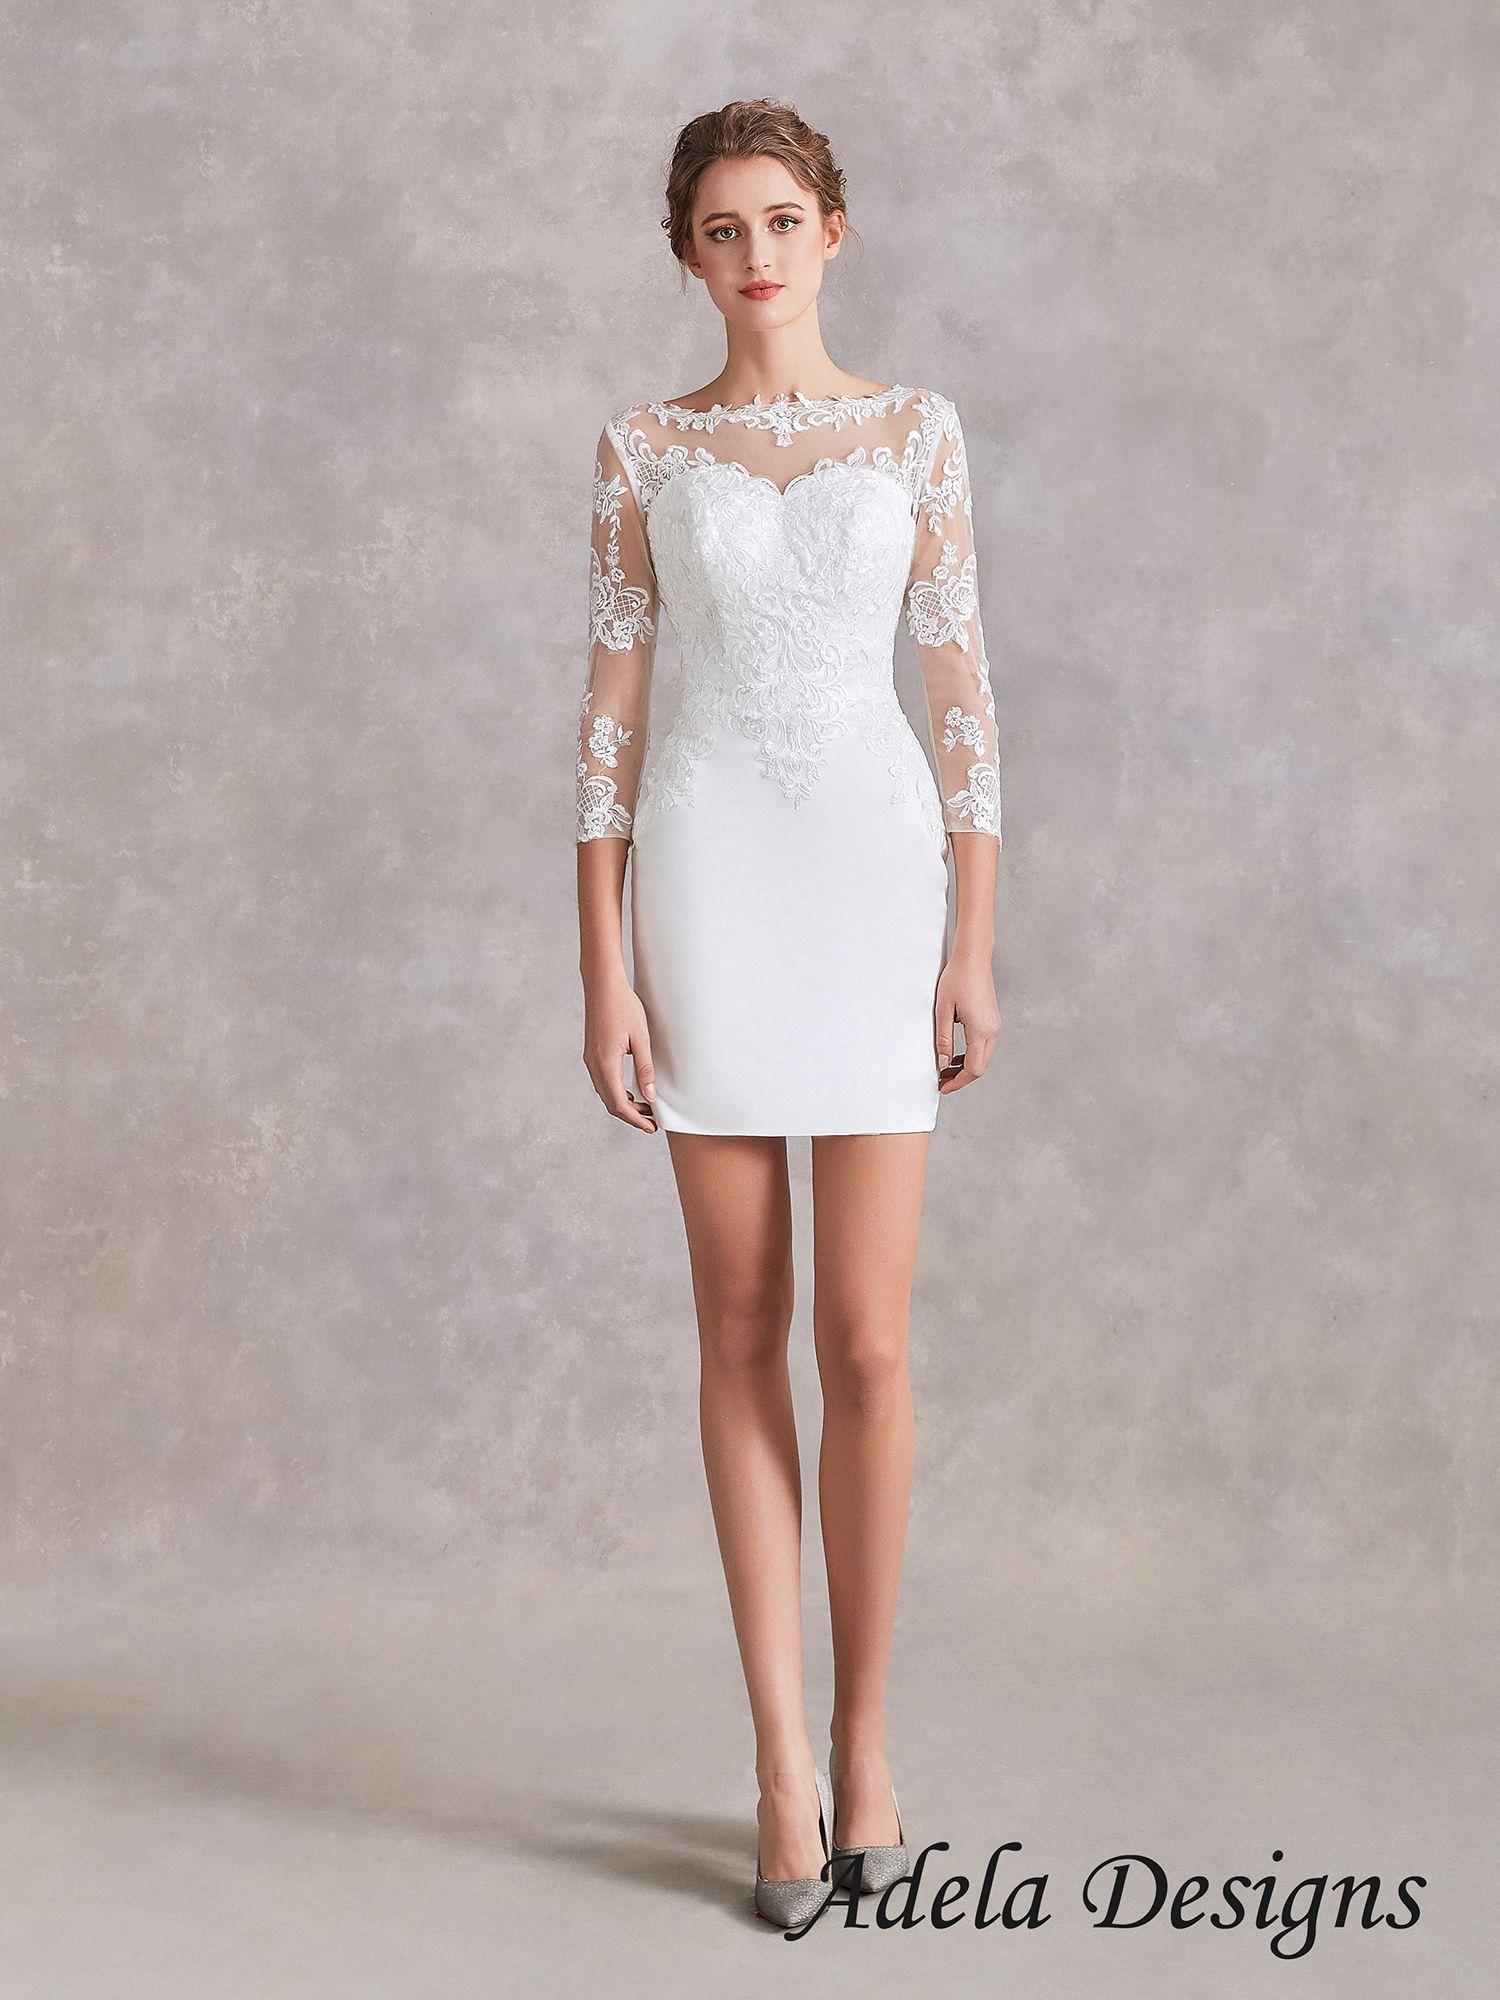 Fited Short Wedding Dress Short Wedding Dress After Wedding Dress Boho Wedding Dress Lace [ 2000 x 1500 Pixel ]